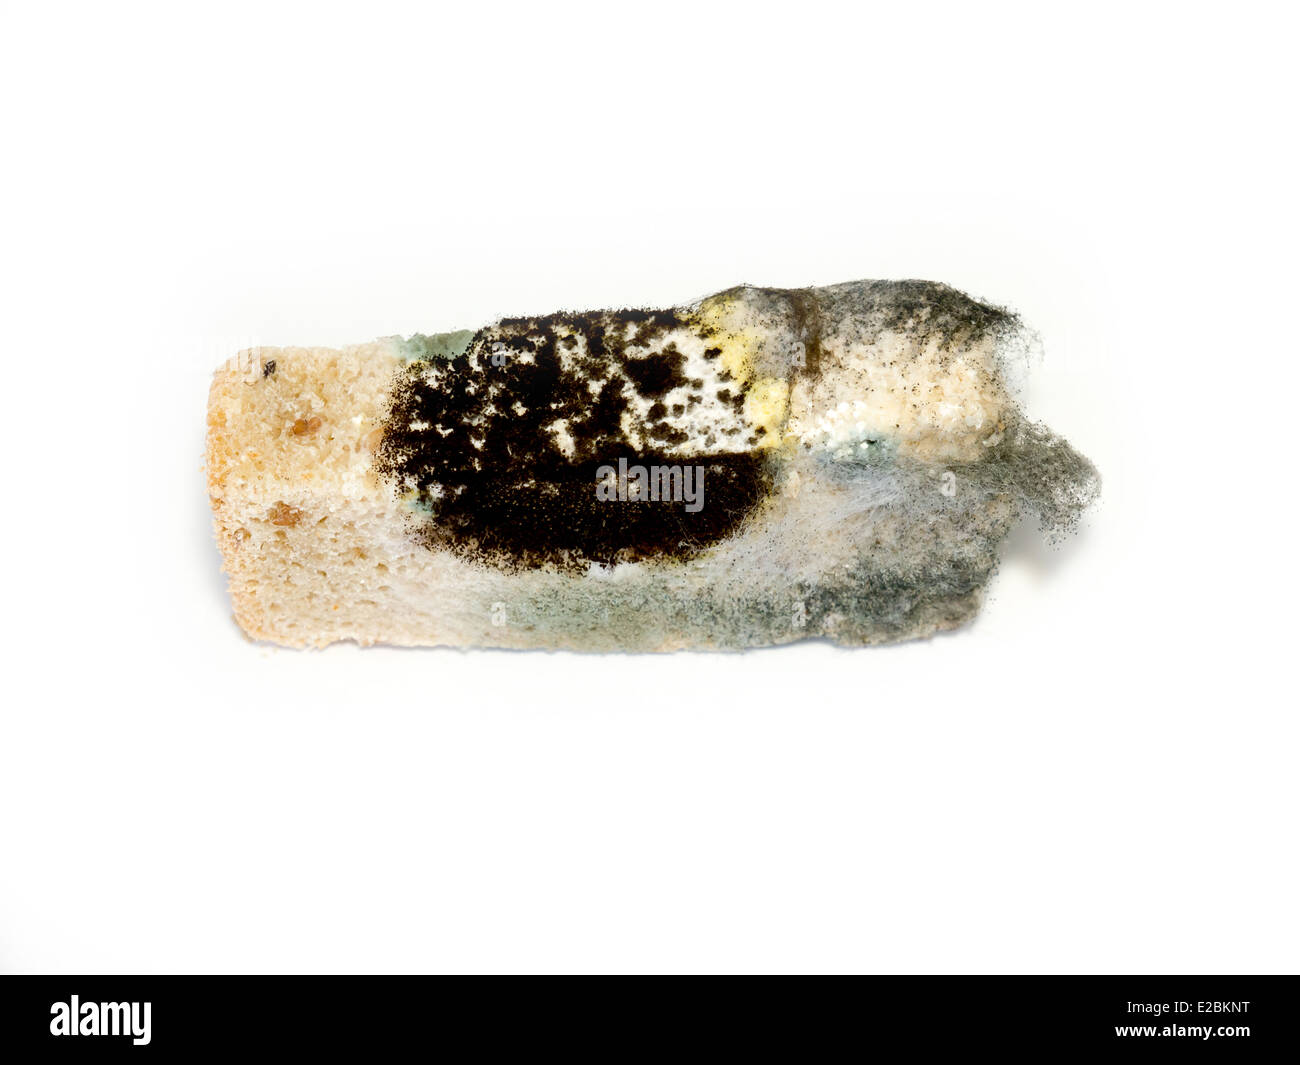 Moldy bread. - Stock Image